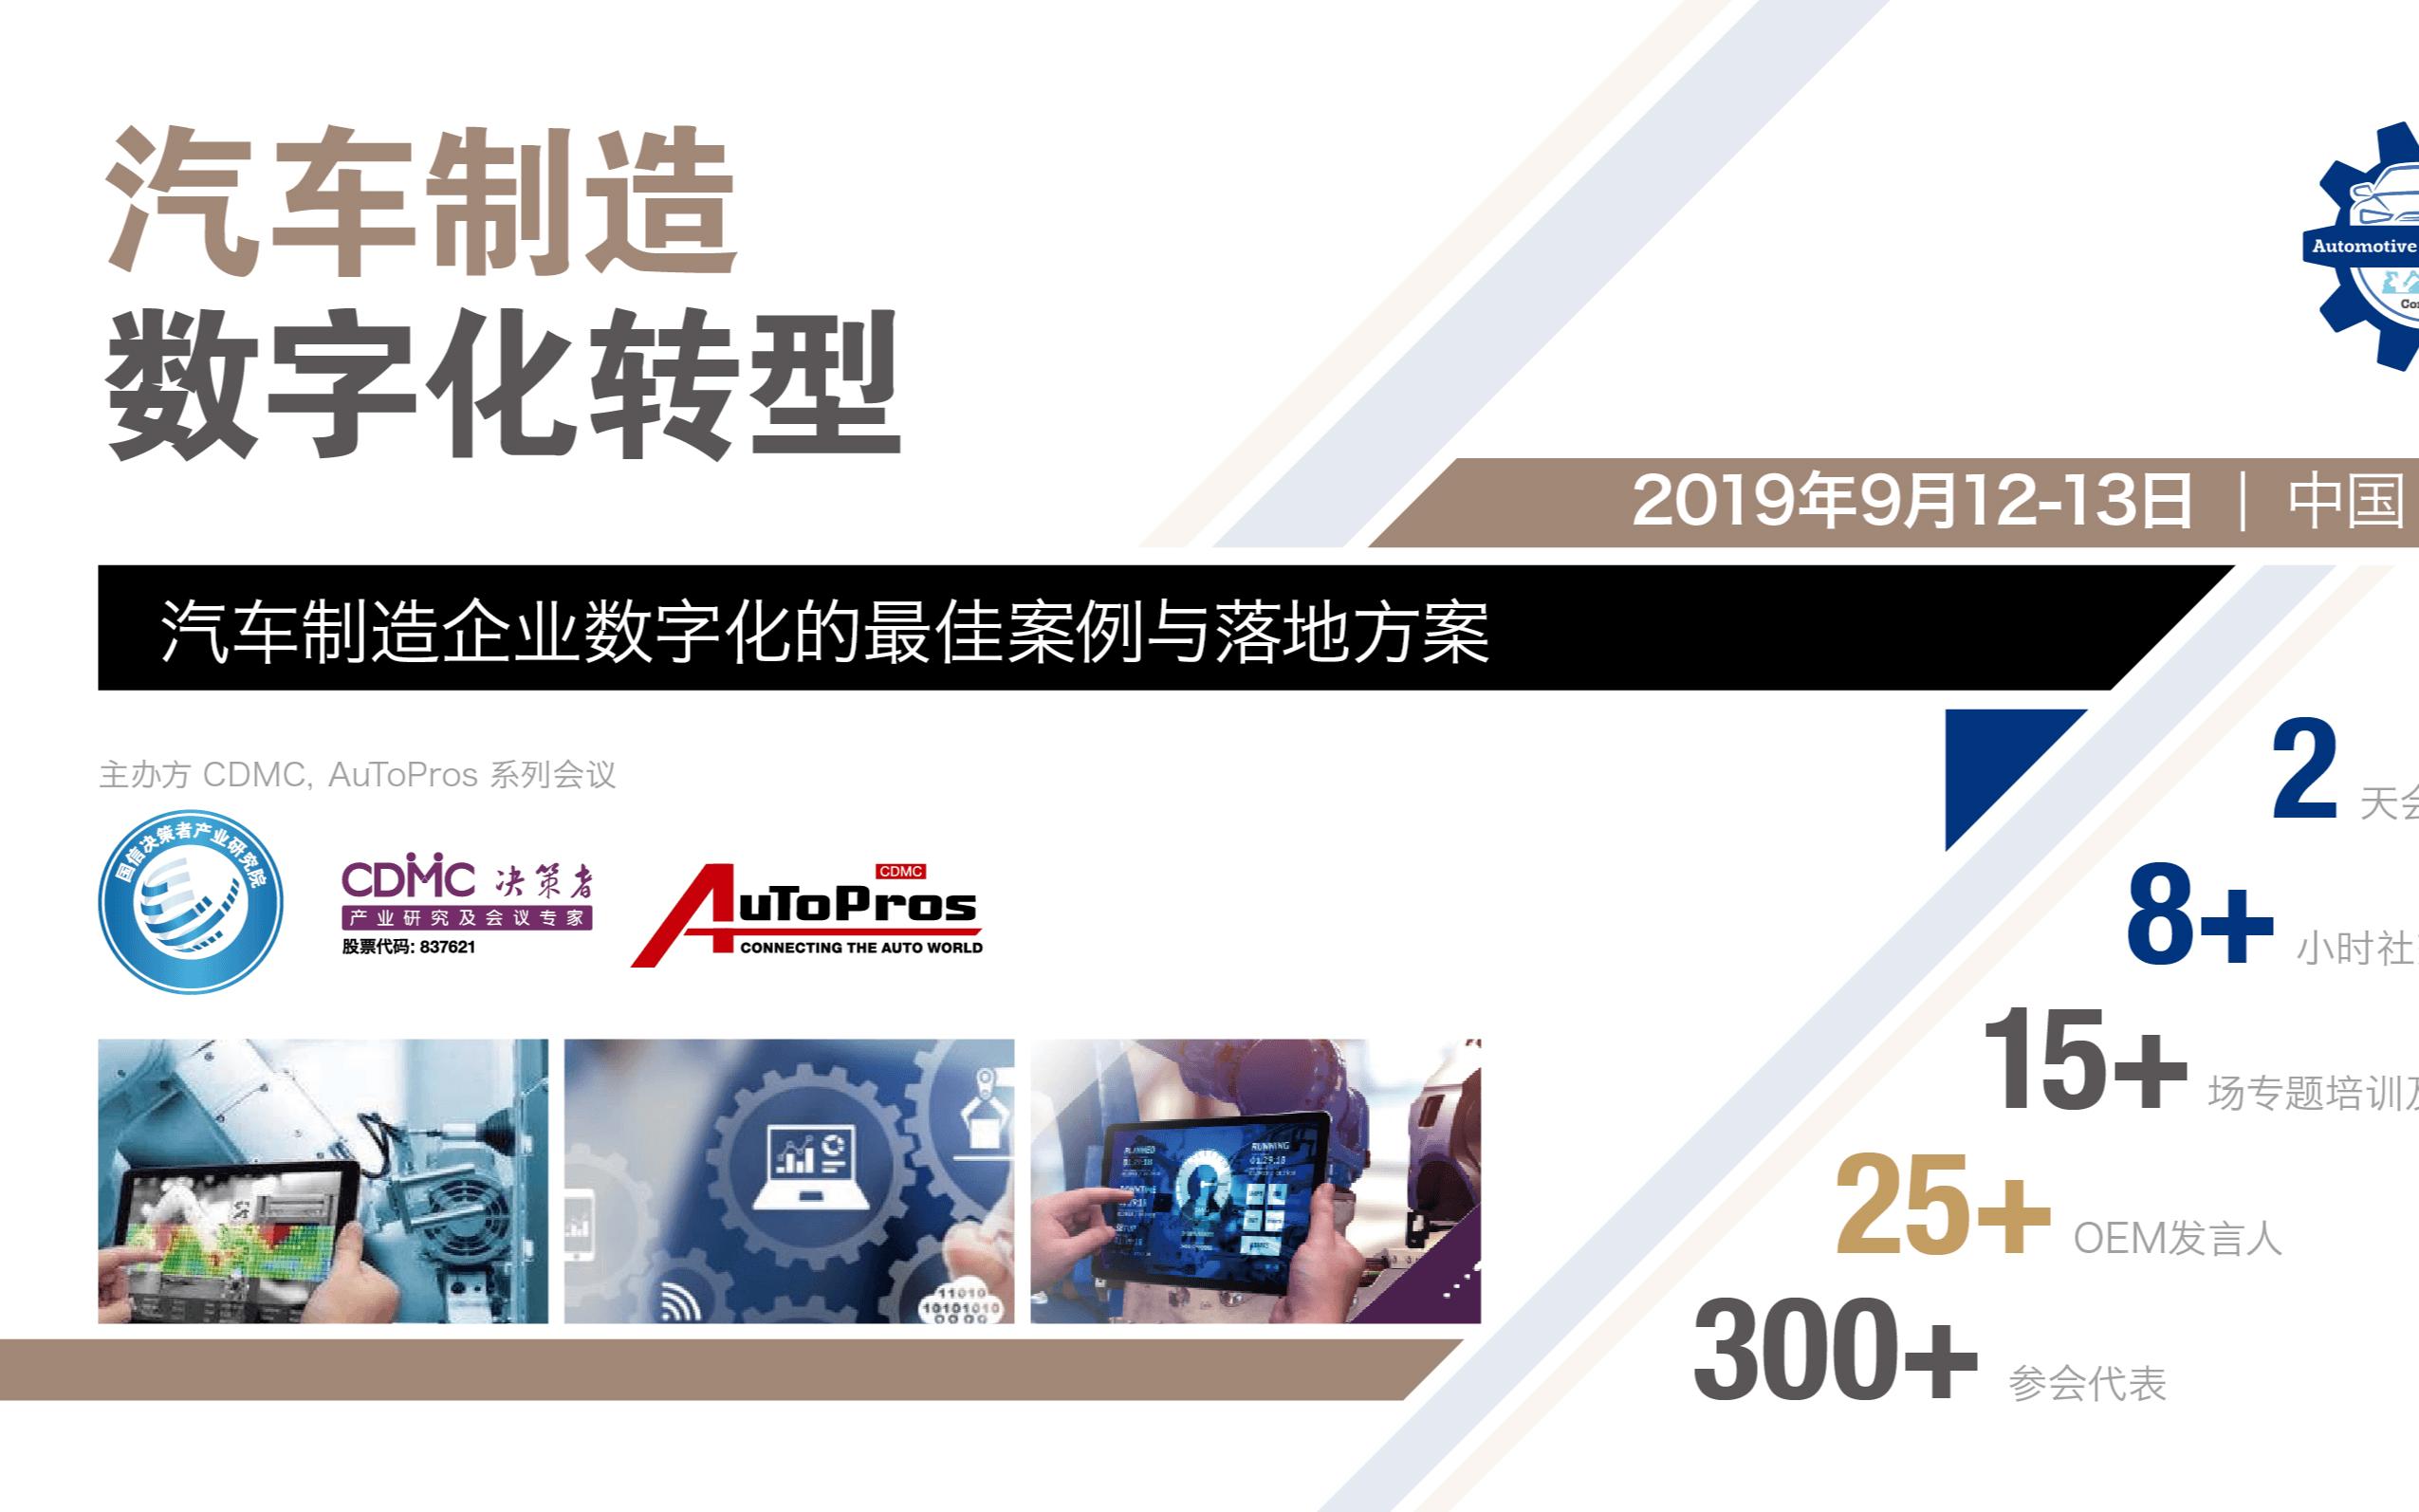 AuToPros 汽车制造数字化转型决策者大会2019